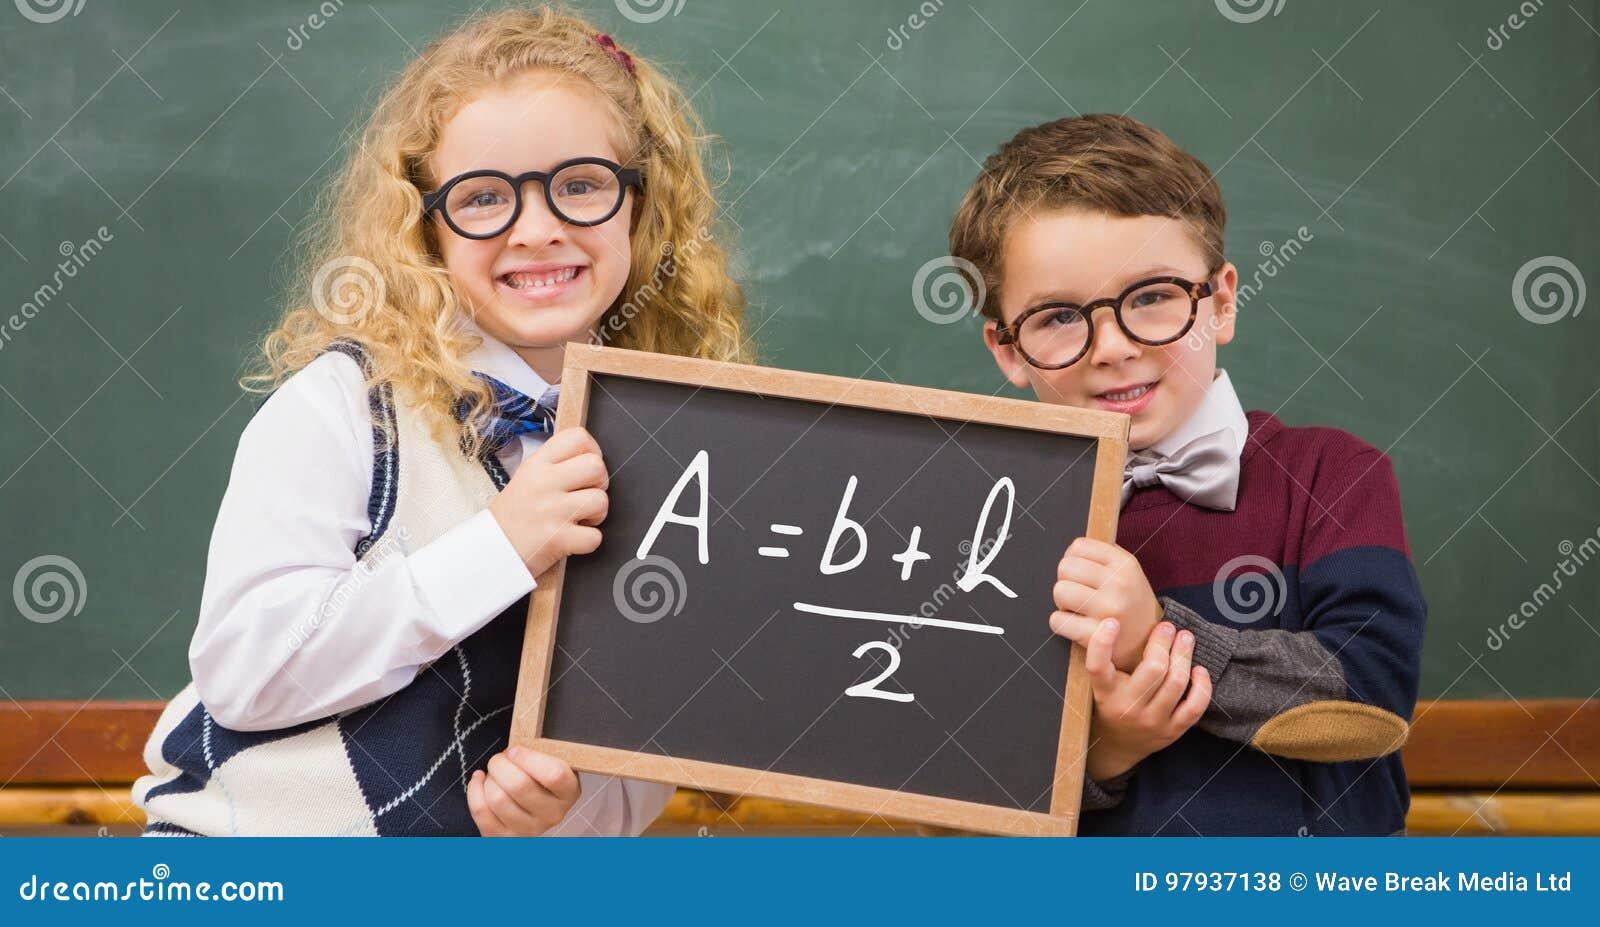 Children holding blackboard with math equation